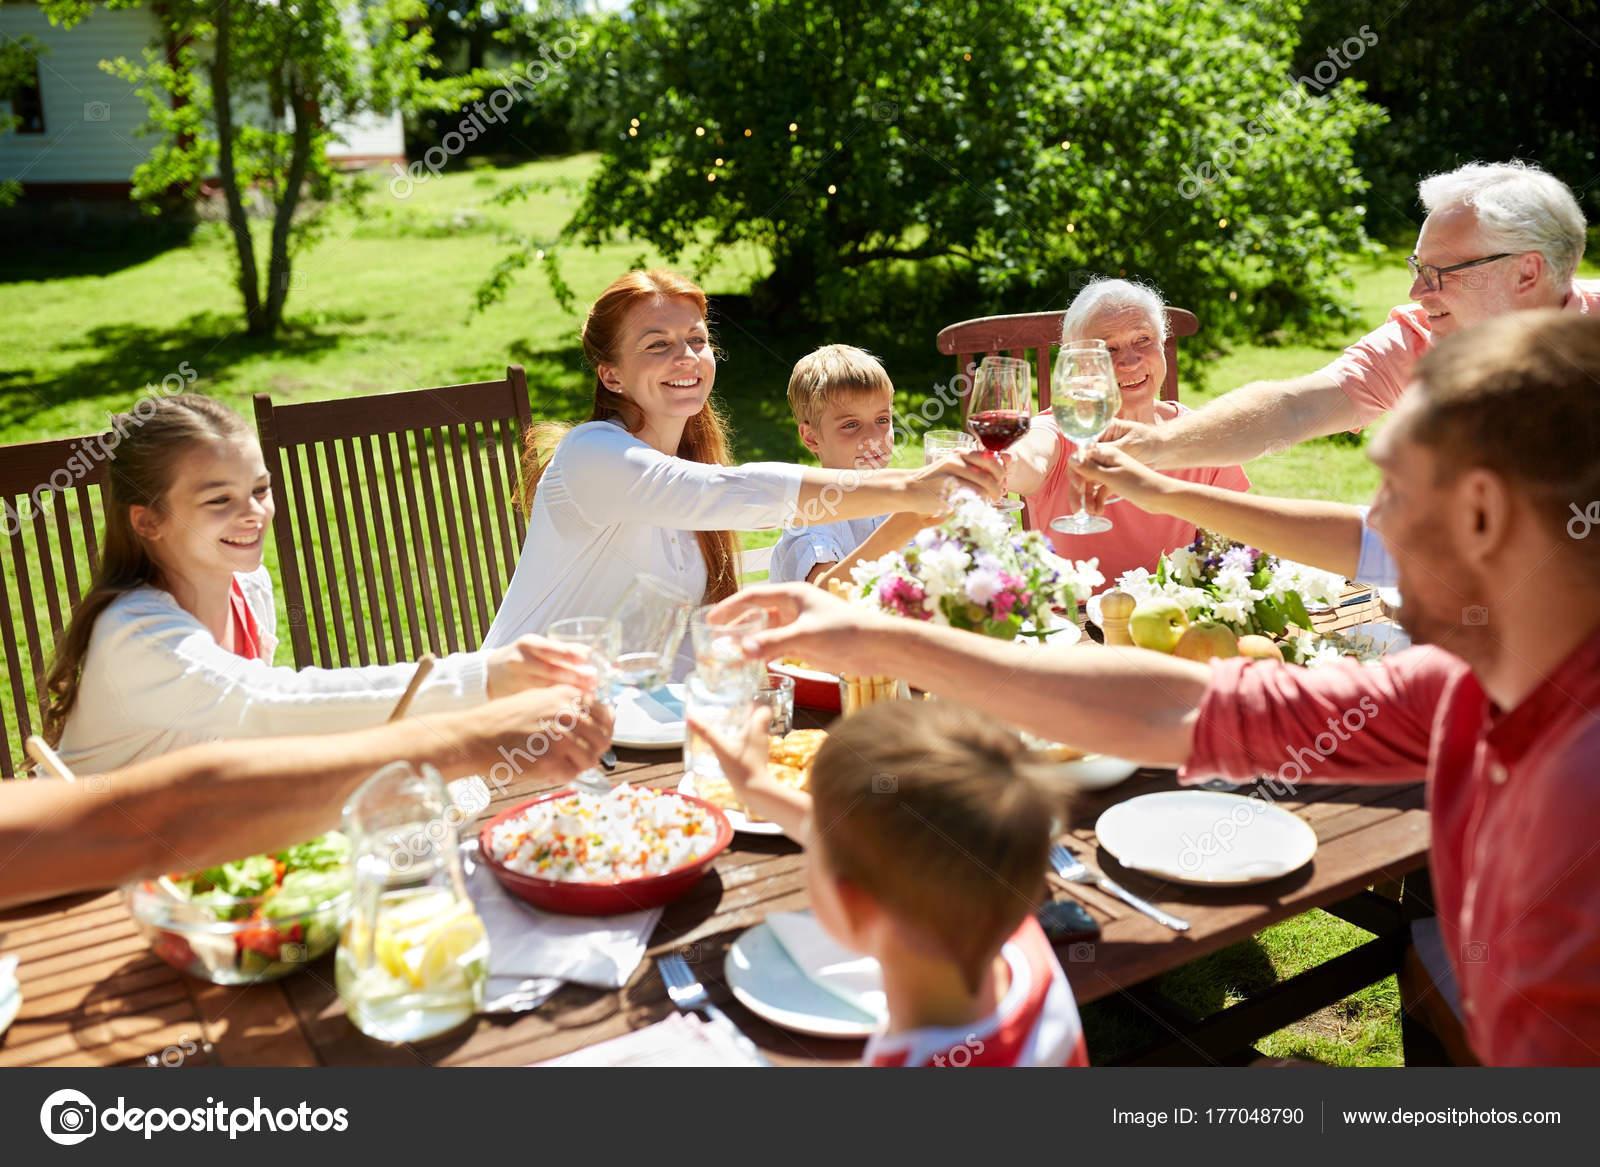 gl ckliche familie mit abendessen oder sommer garten party stockfoto syda productions 177048790. Black Bedroom Furniture Sets. Home Design Ideas